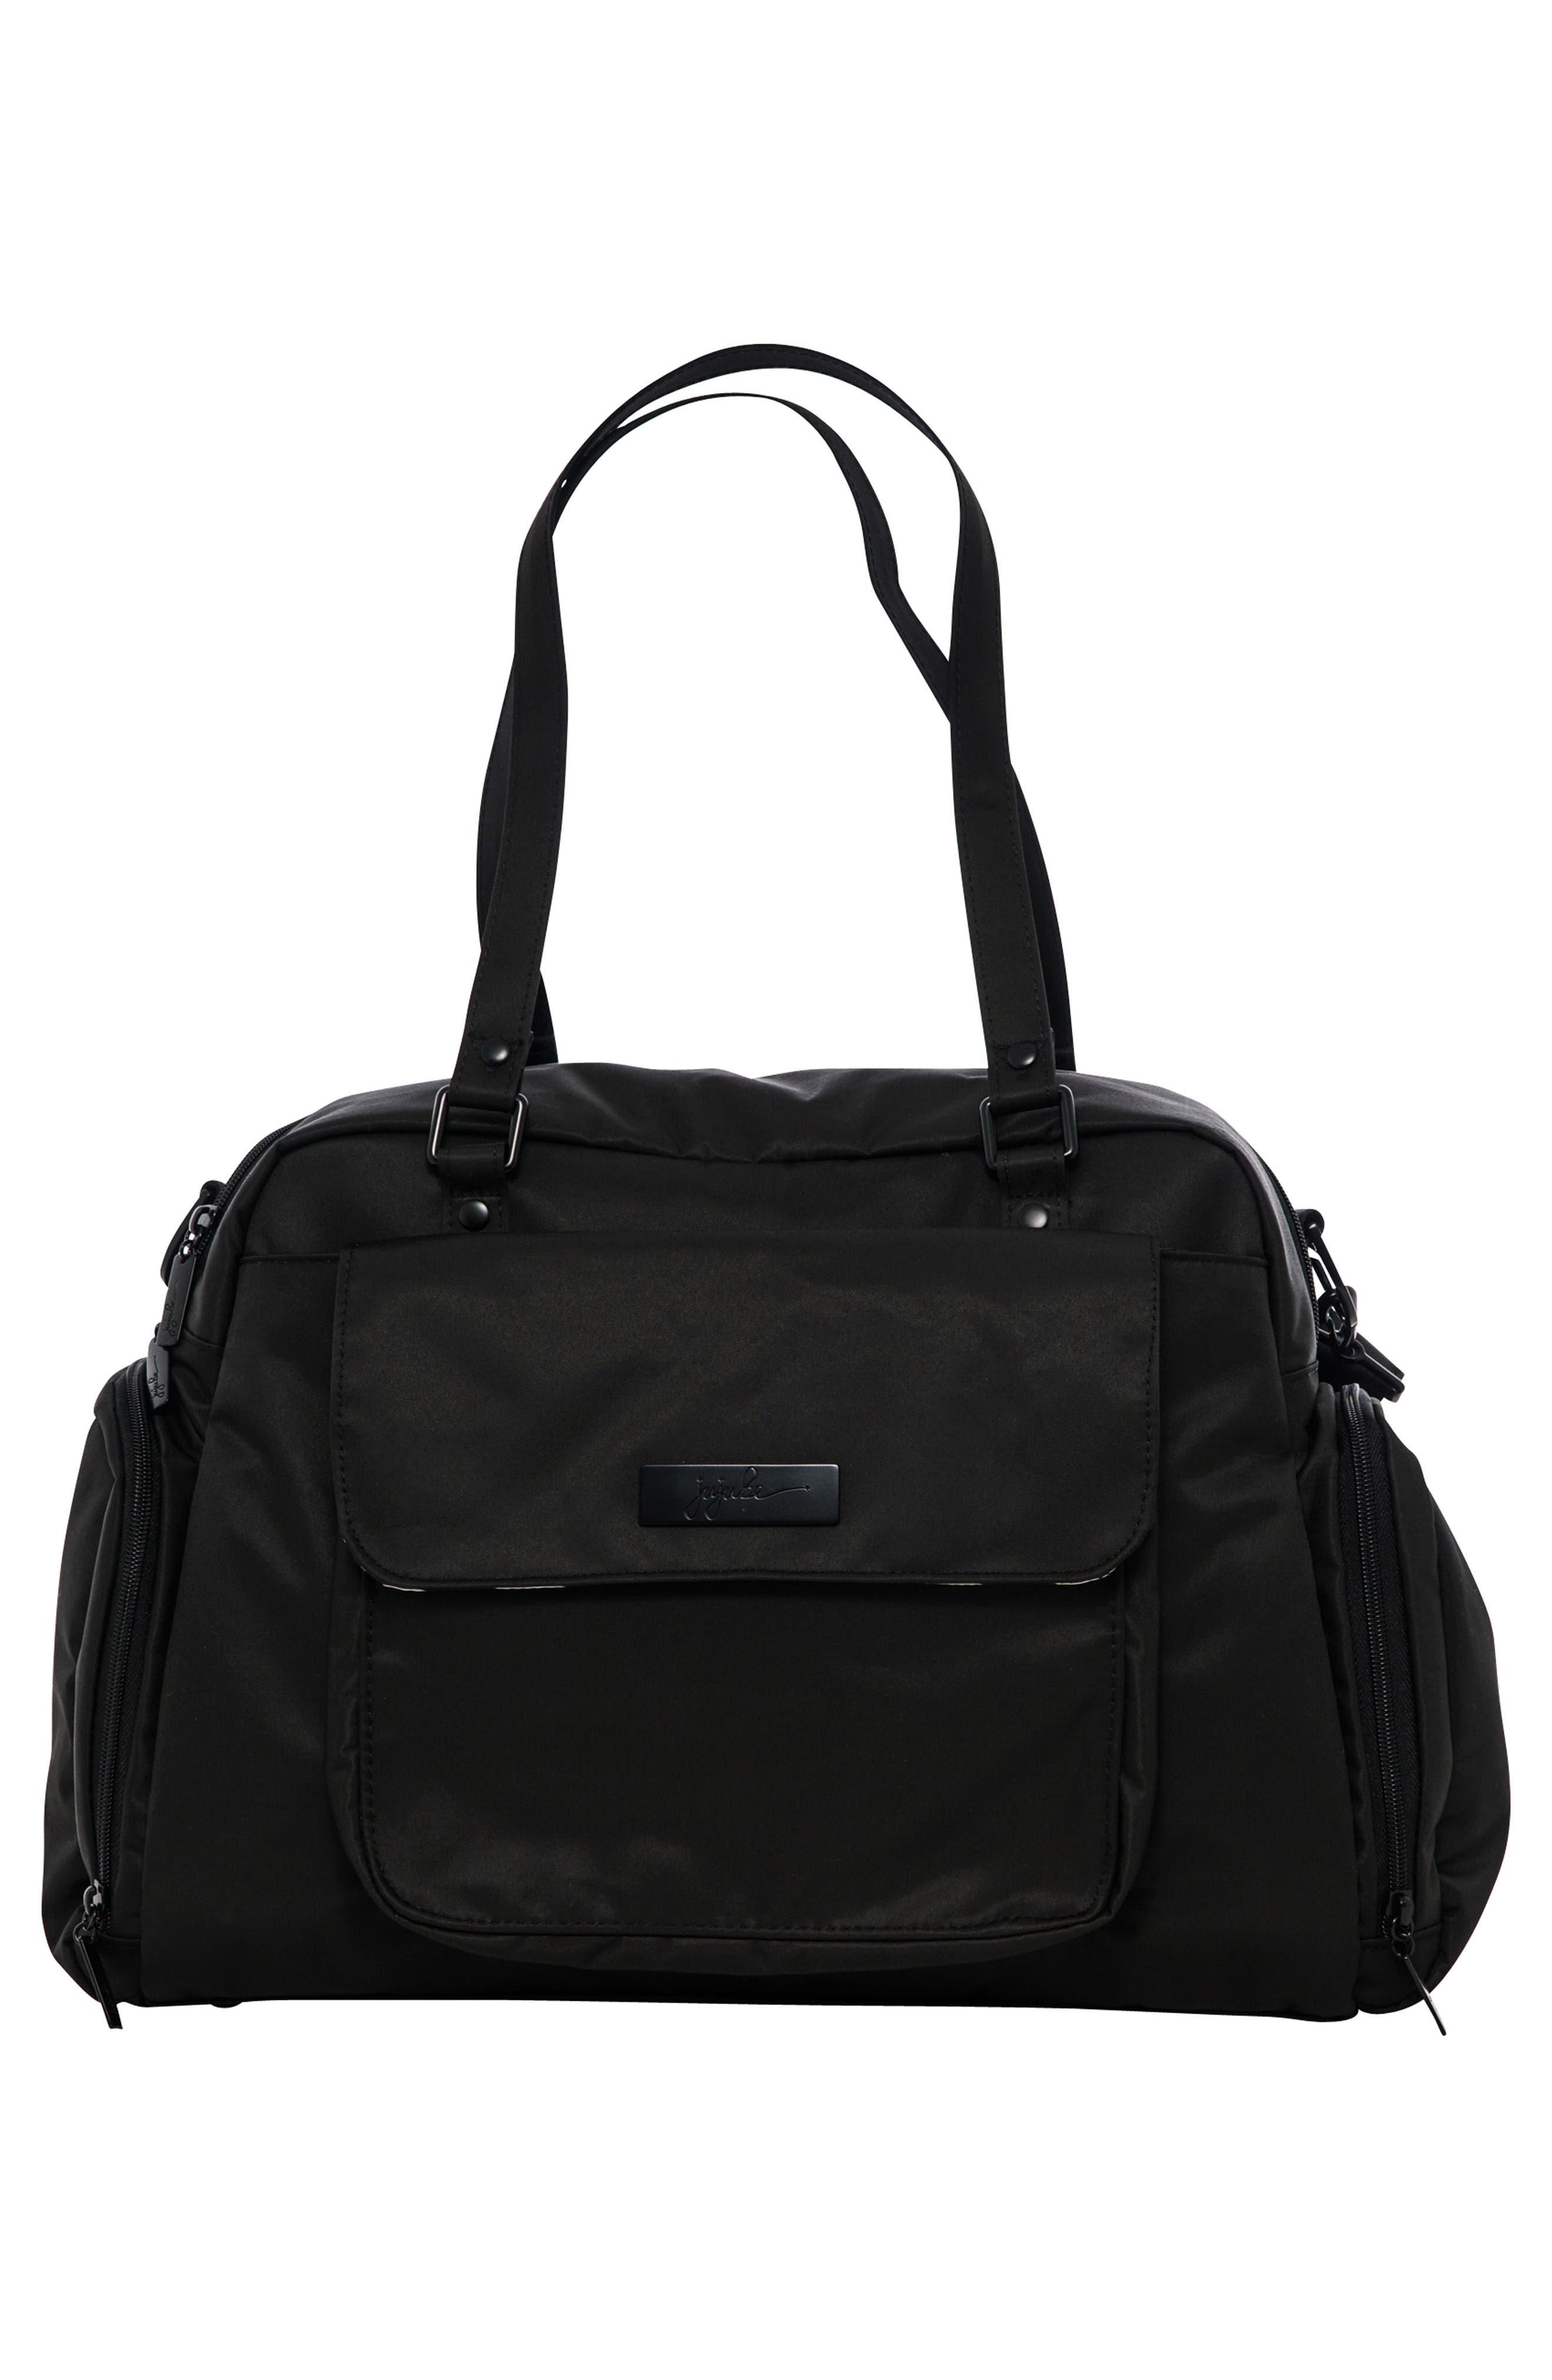 Onyx Be Pumped Bag,                             Alternate thumbnail 2, color,                             BLACK OUT